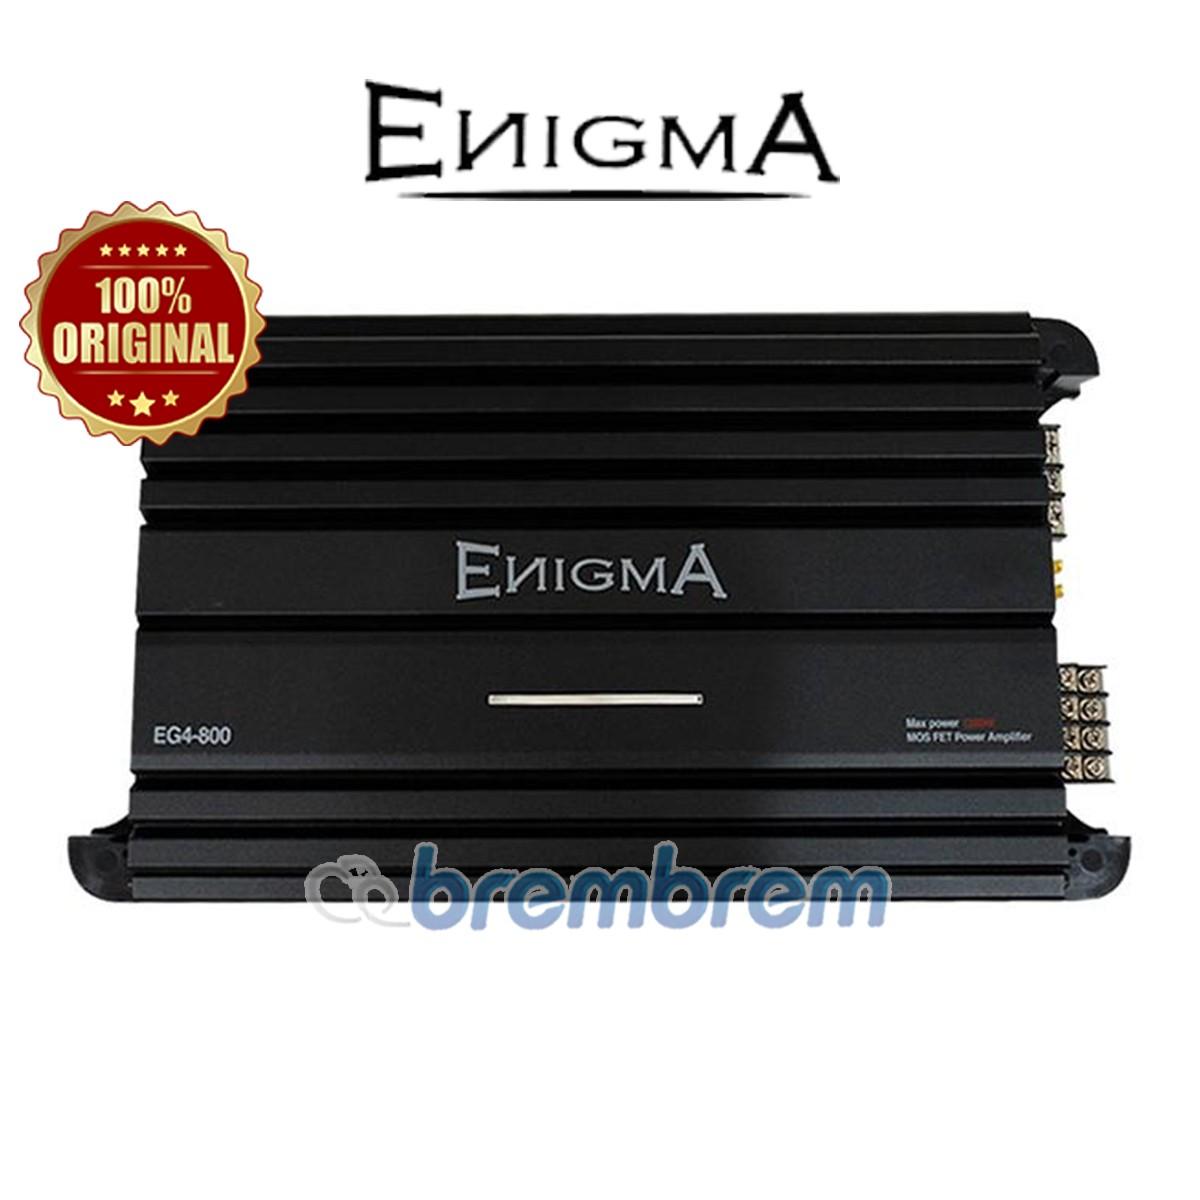 ENIGMA EG4 800 - POWER 4 CHANNEL